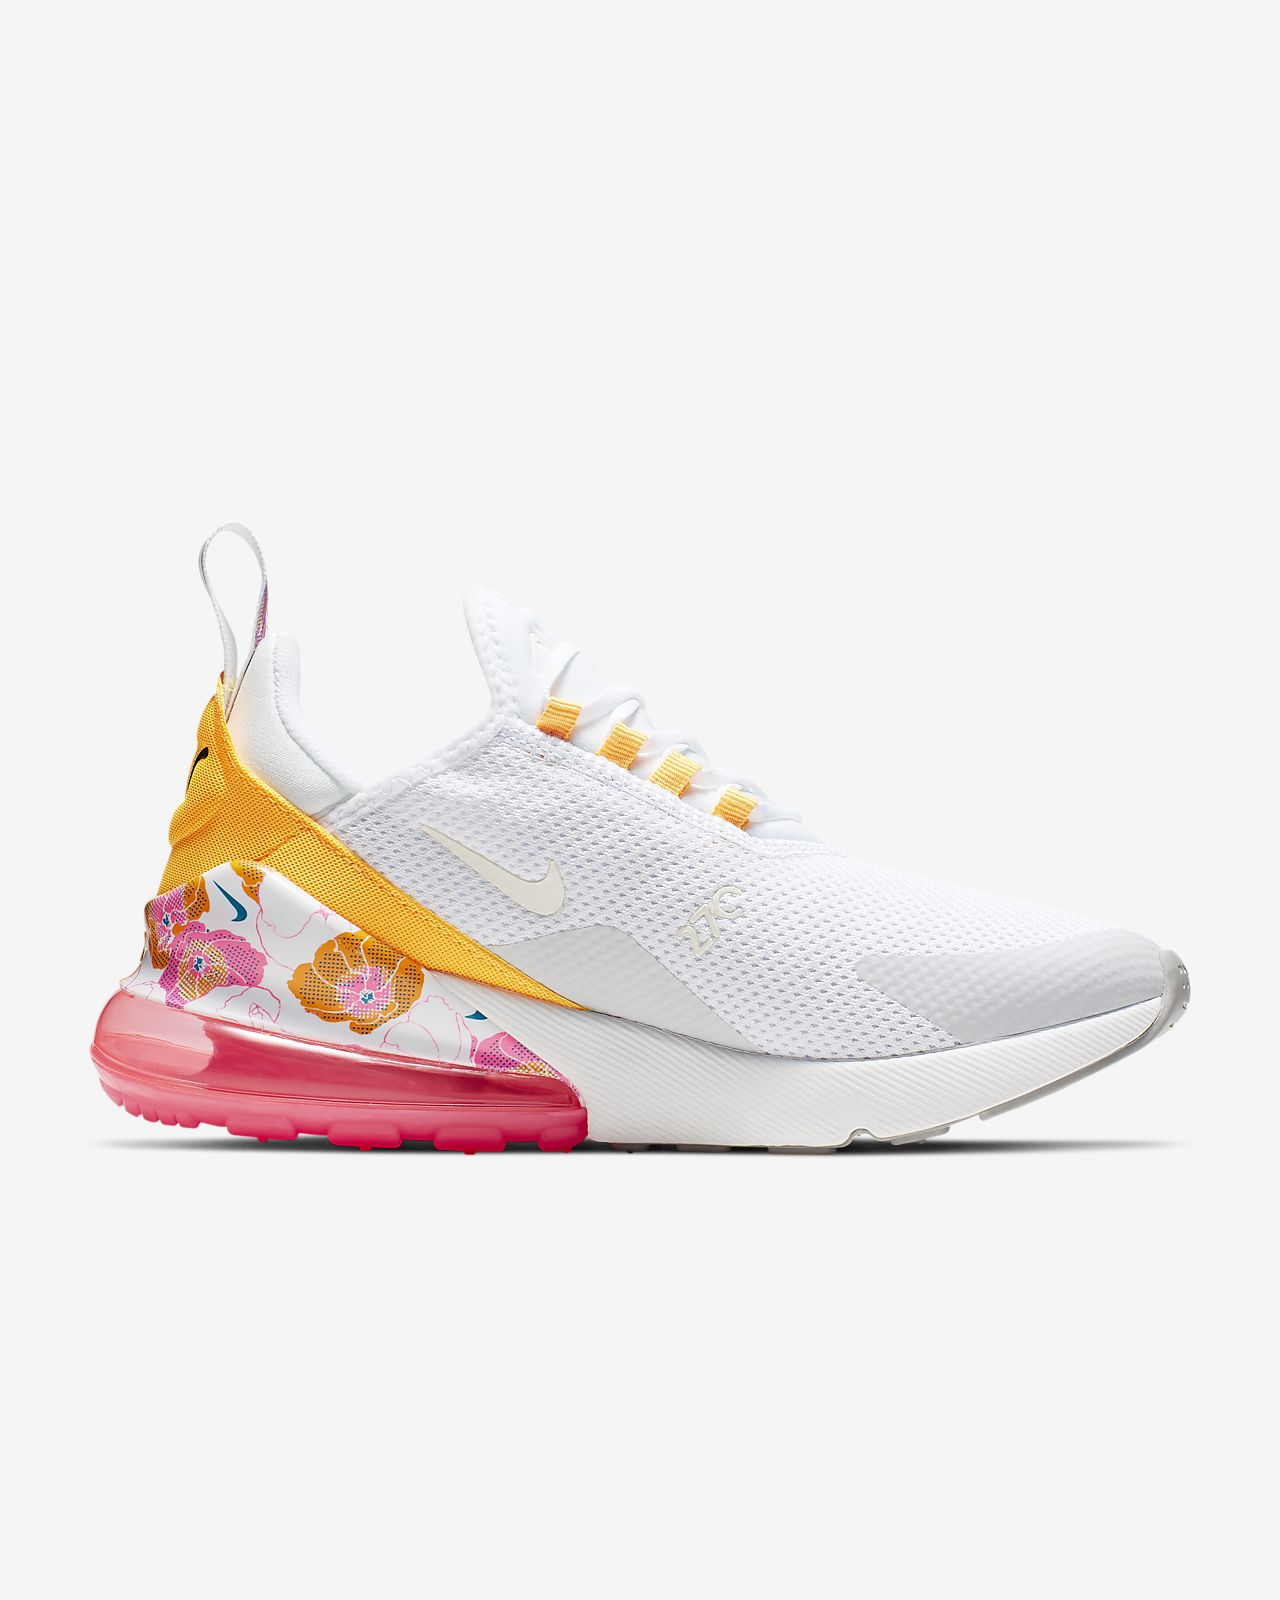 online store 6748d 16a2e ... Nike Air Max 270 SE Floral Damenschuh